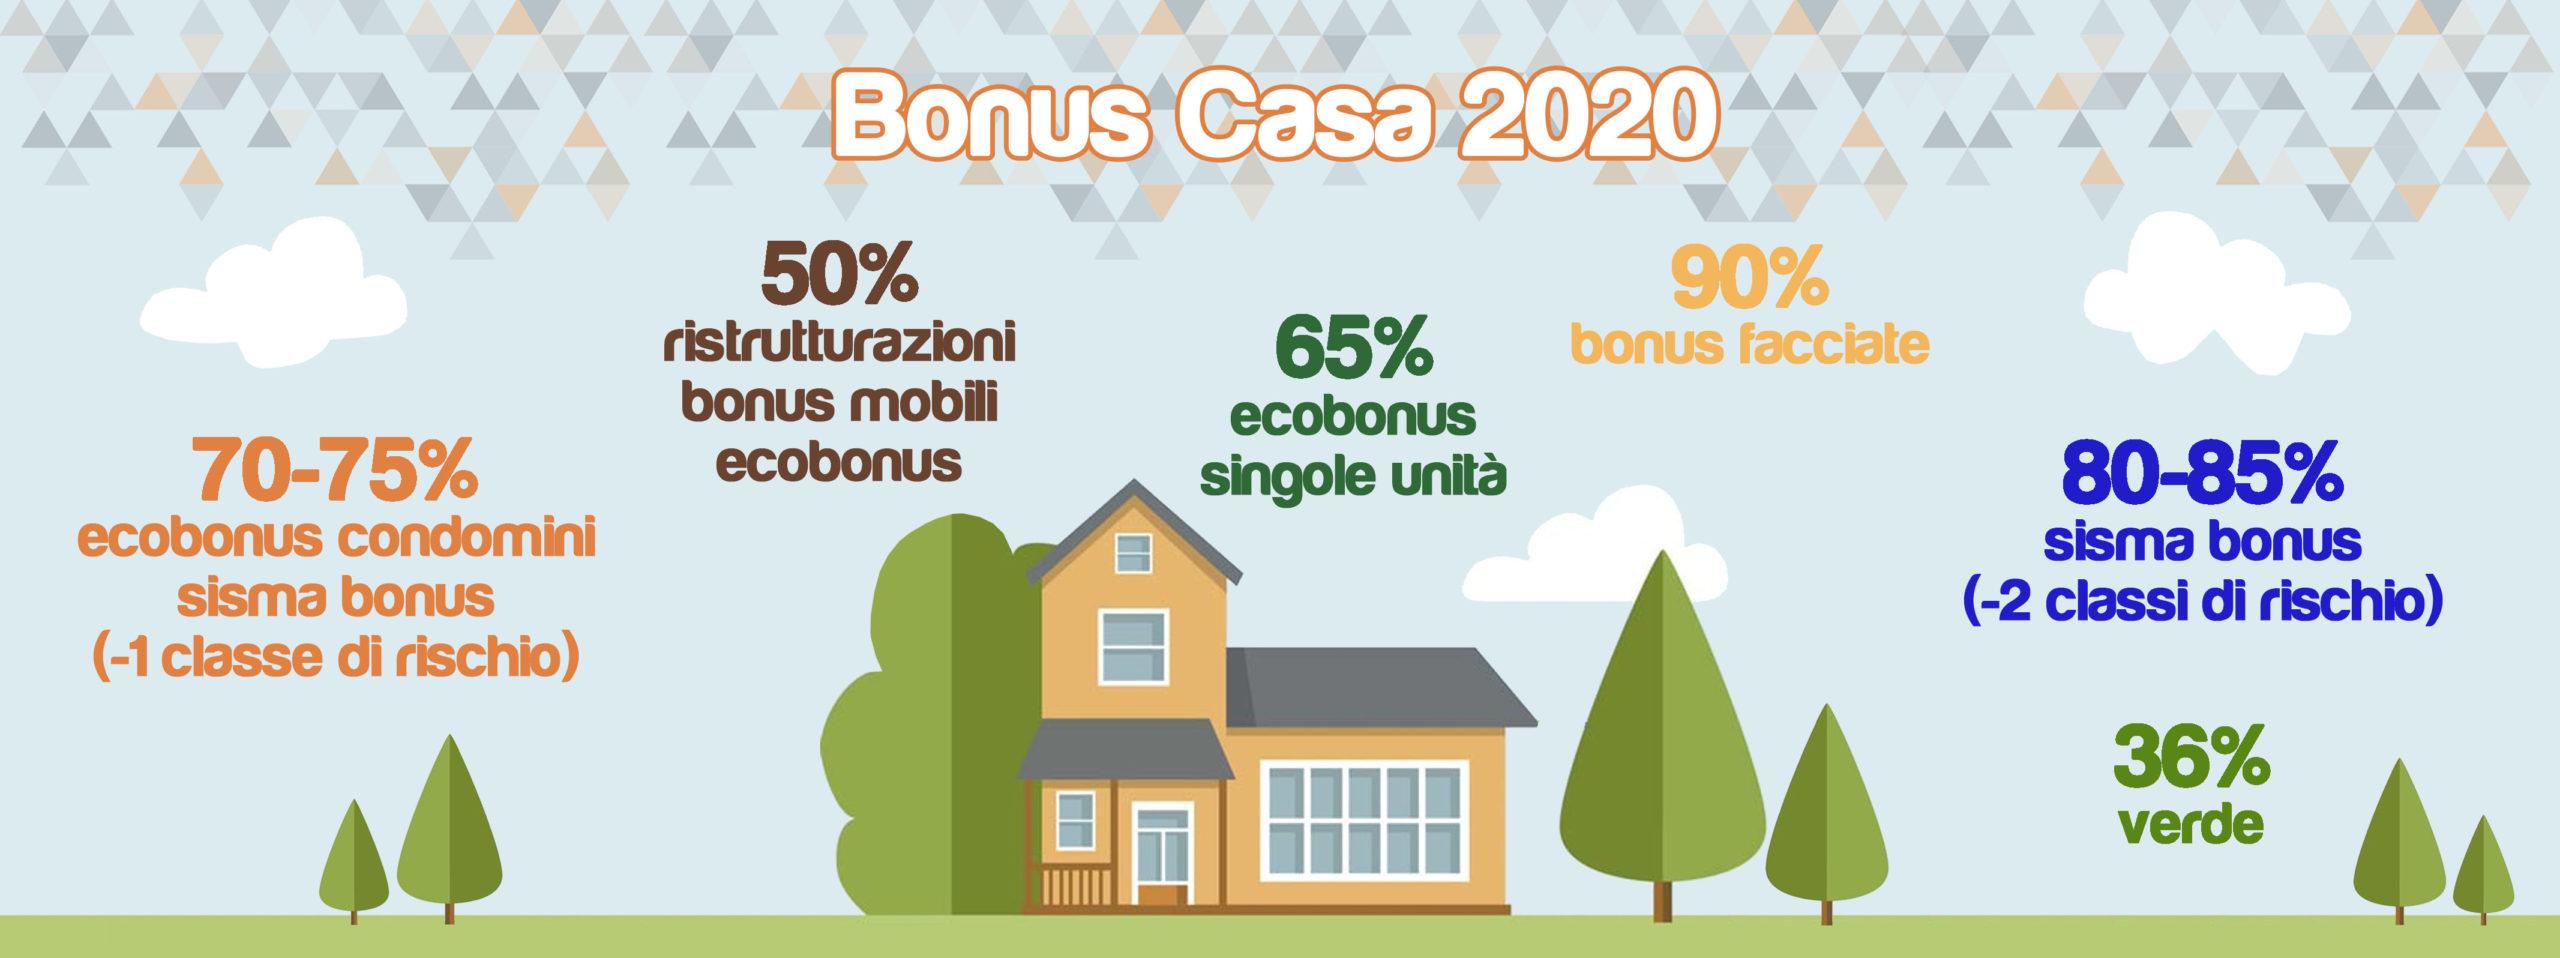 Detrazione Tinteggiatura Interna 2016 bonus casa 2020 - doser